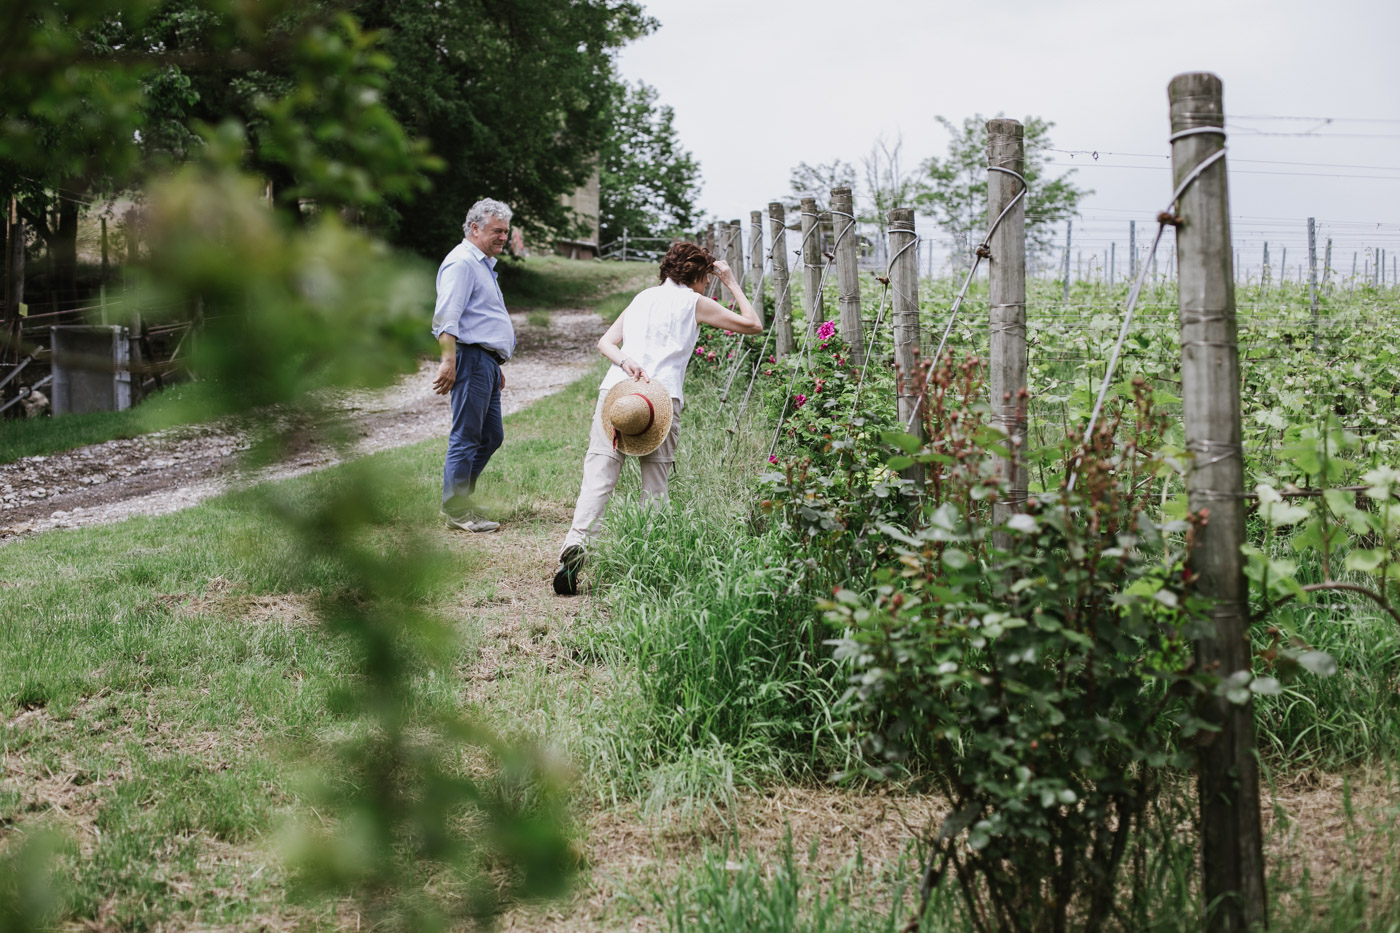 Wine tour a piedi in Valtenesi